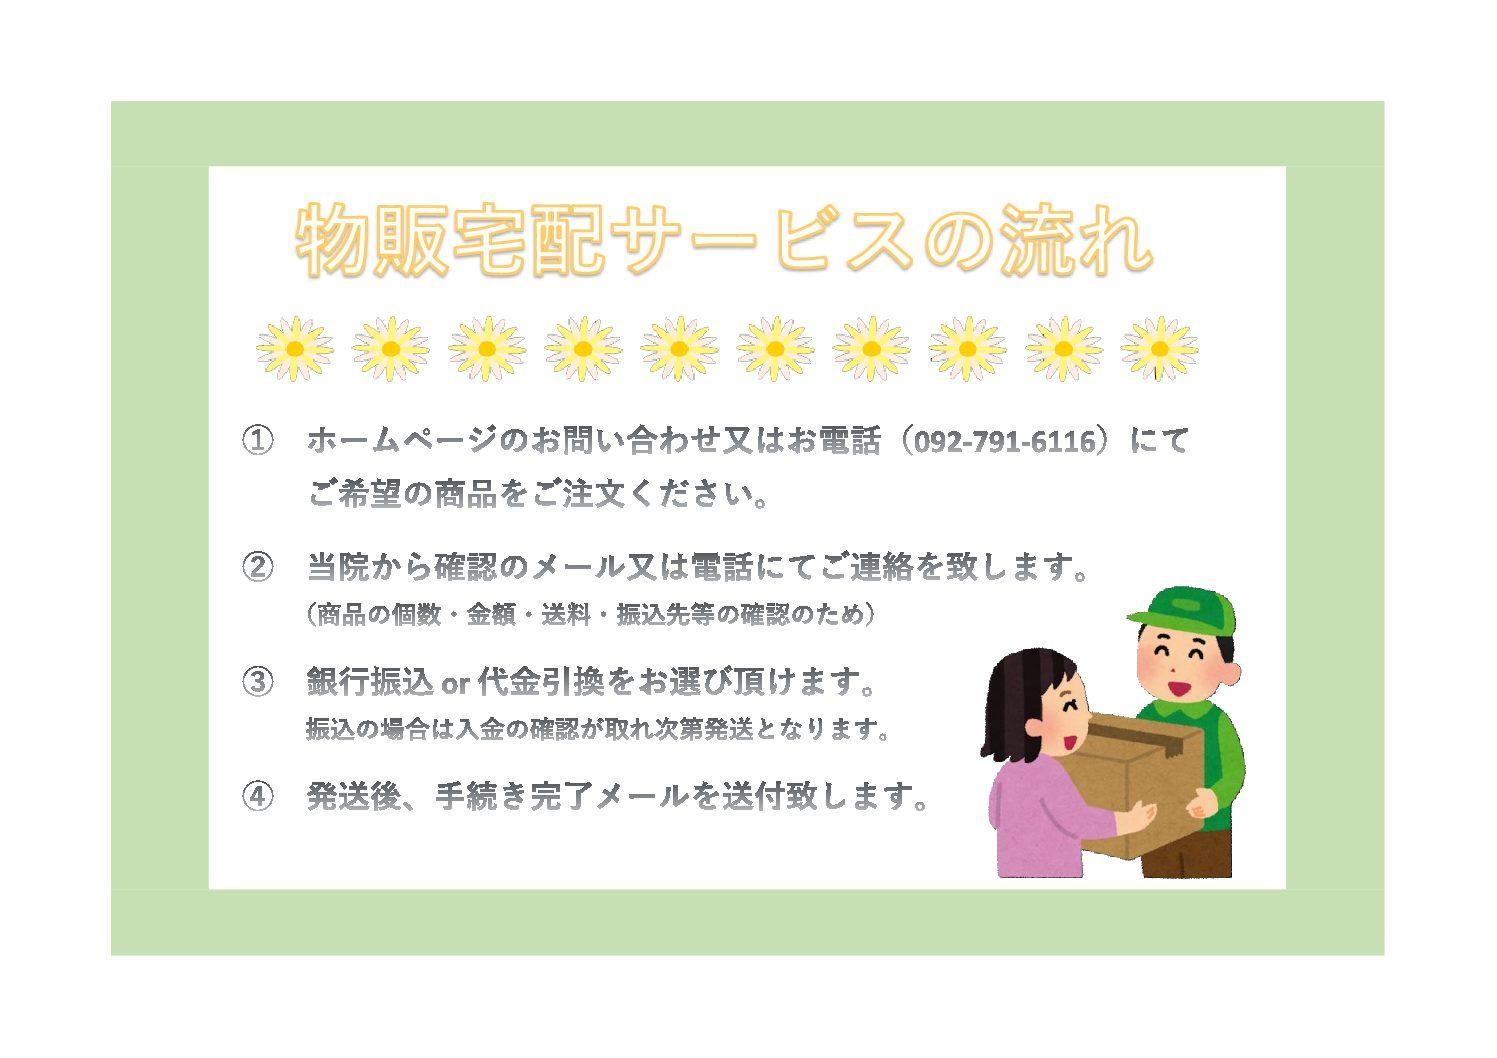 【 NEW 】物販宅配サービス開始🚚